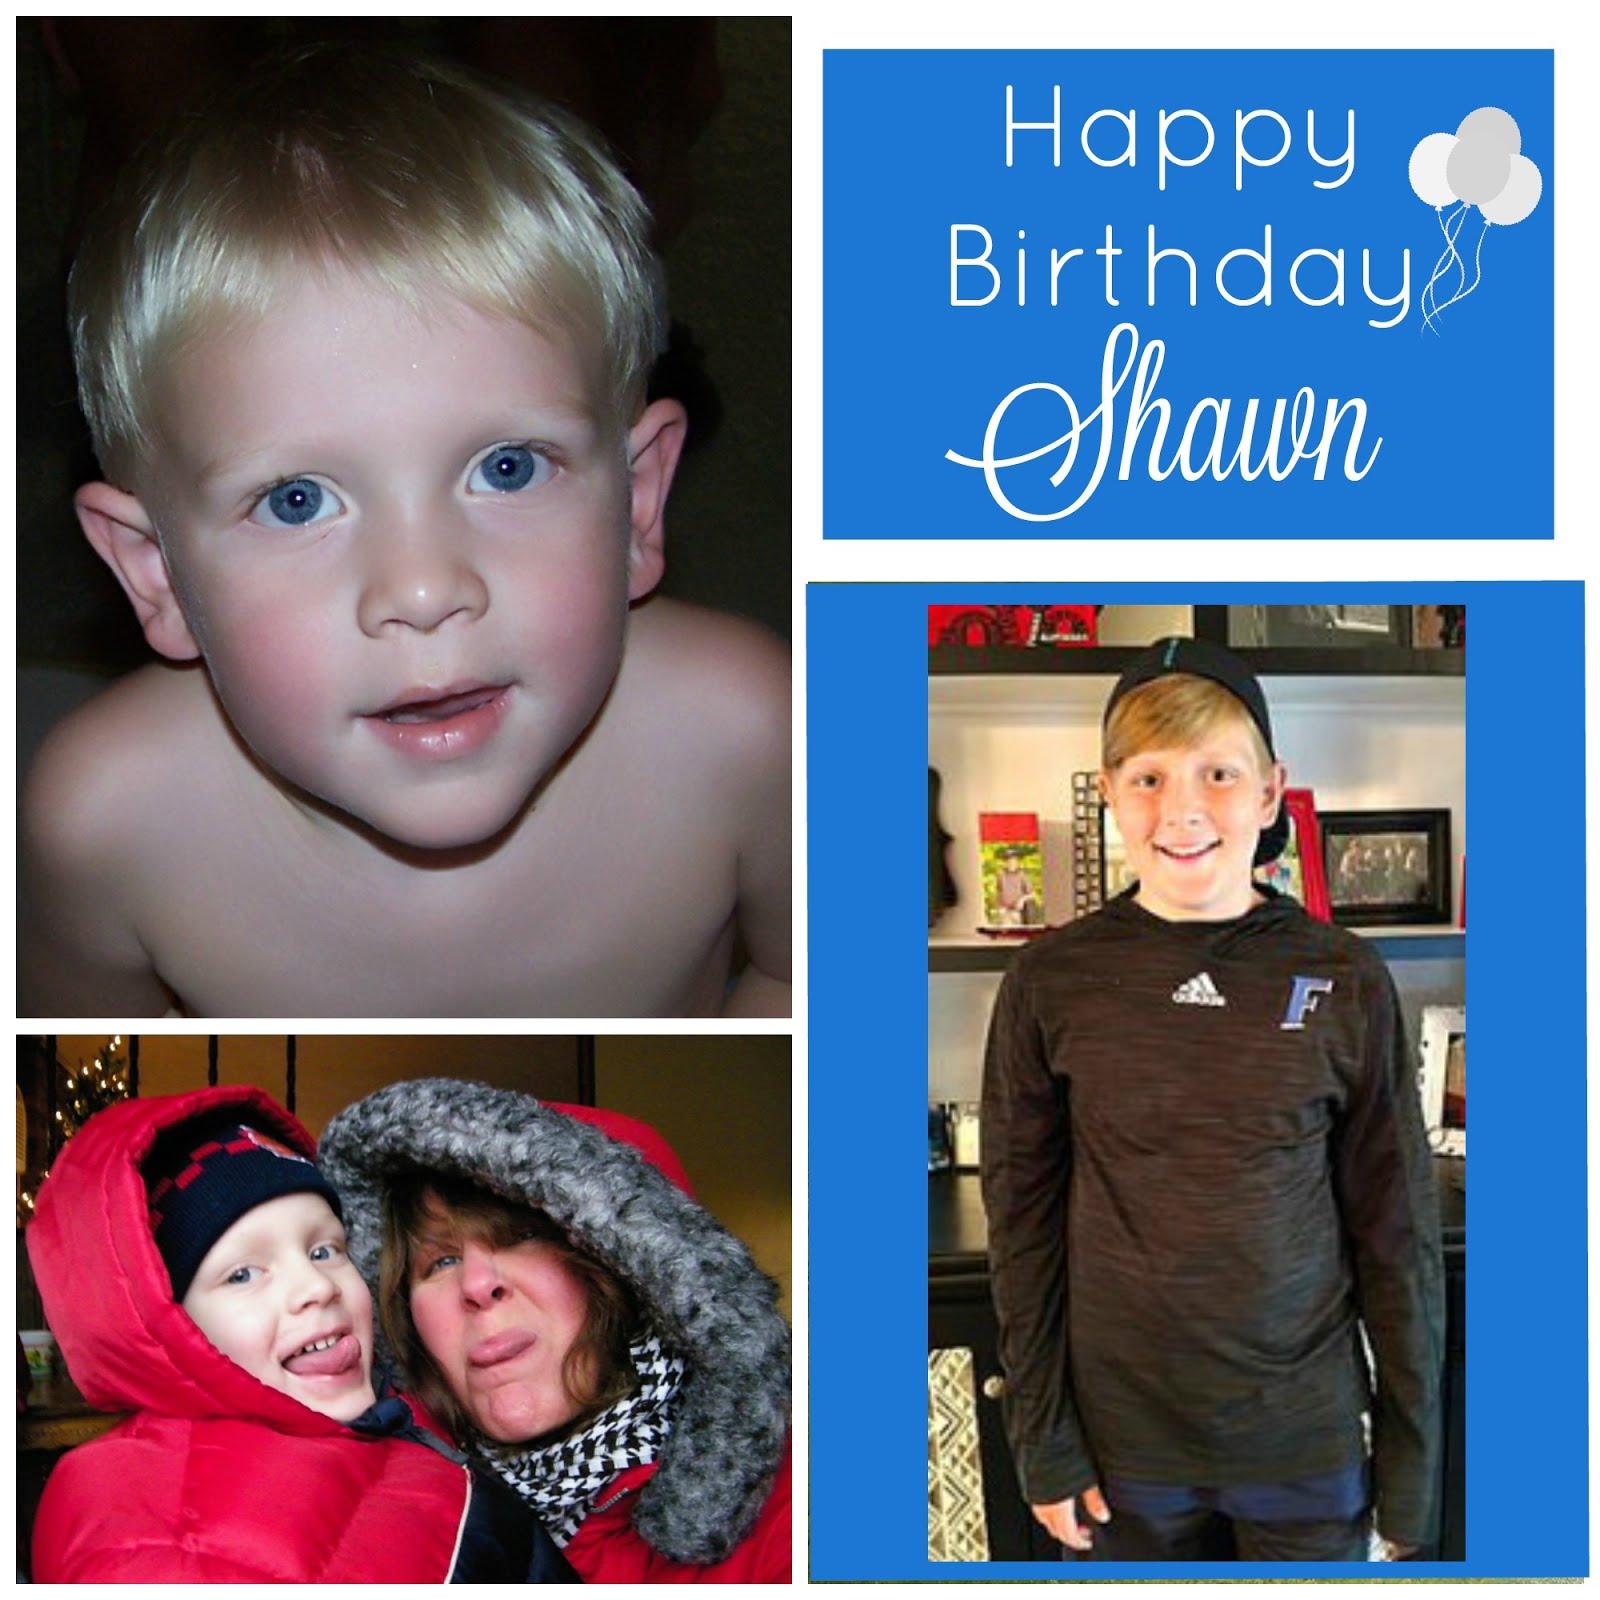 Shawn turns 13